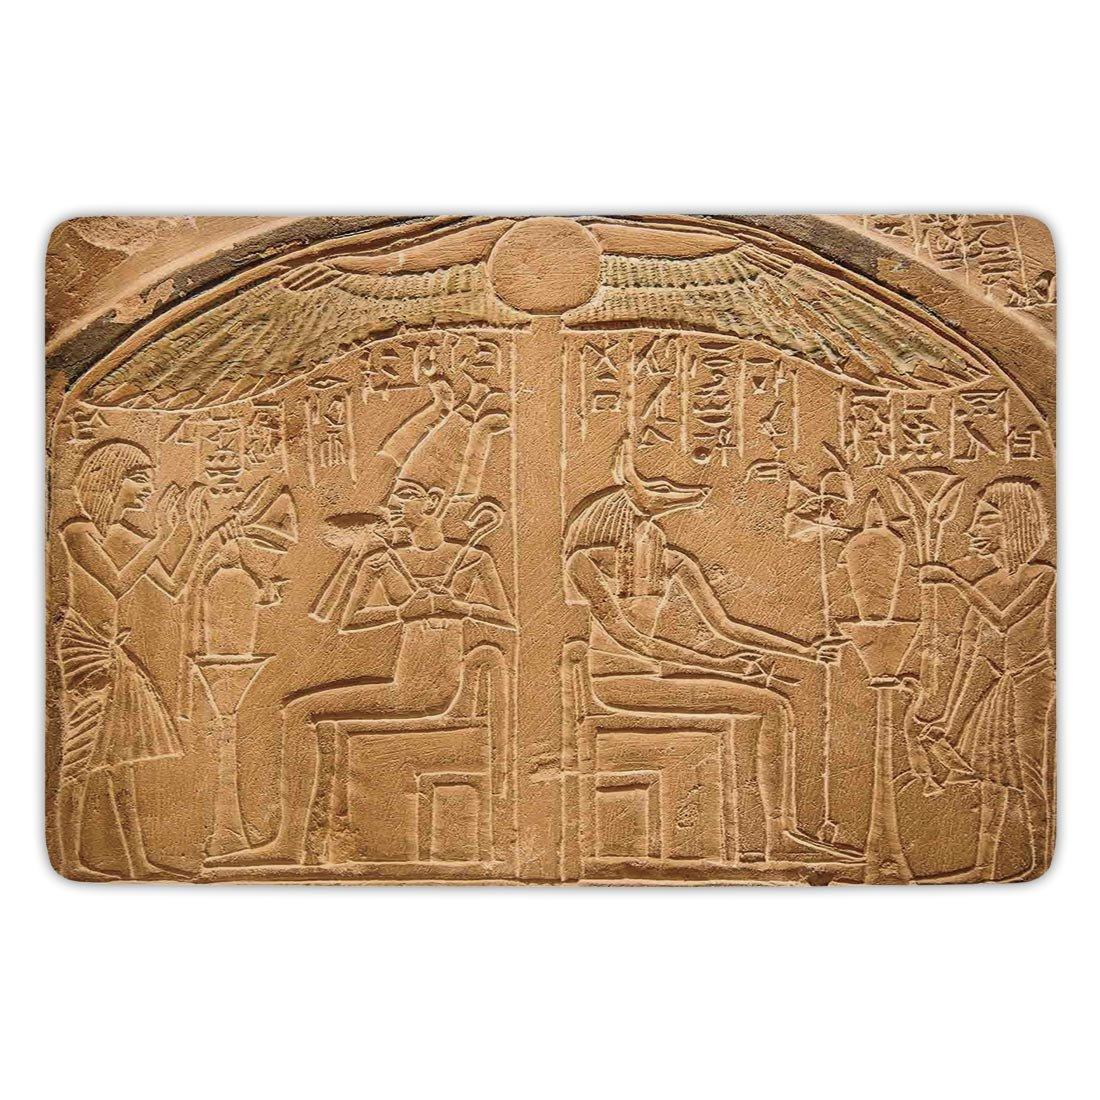 Bathroom Bath Rug Kitchen Floor Mat Carpet,Egyptian,Egyptian Hieroglyphs on the Wall Stone Surface Scripts Ancient Arts Theme Image,Light Brown,Flannel Microfiber Non-slip Soft Absorbent